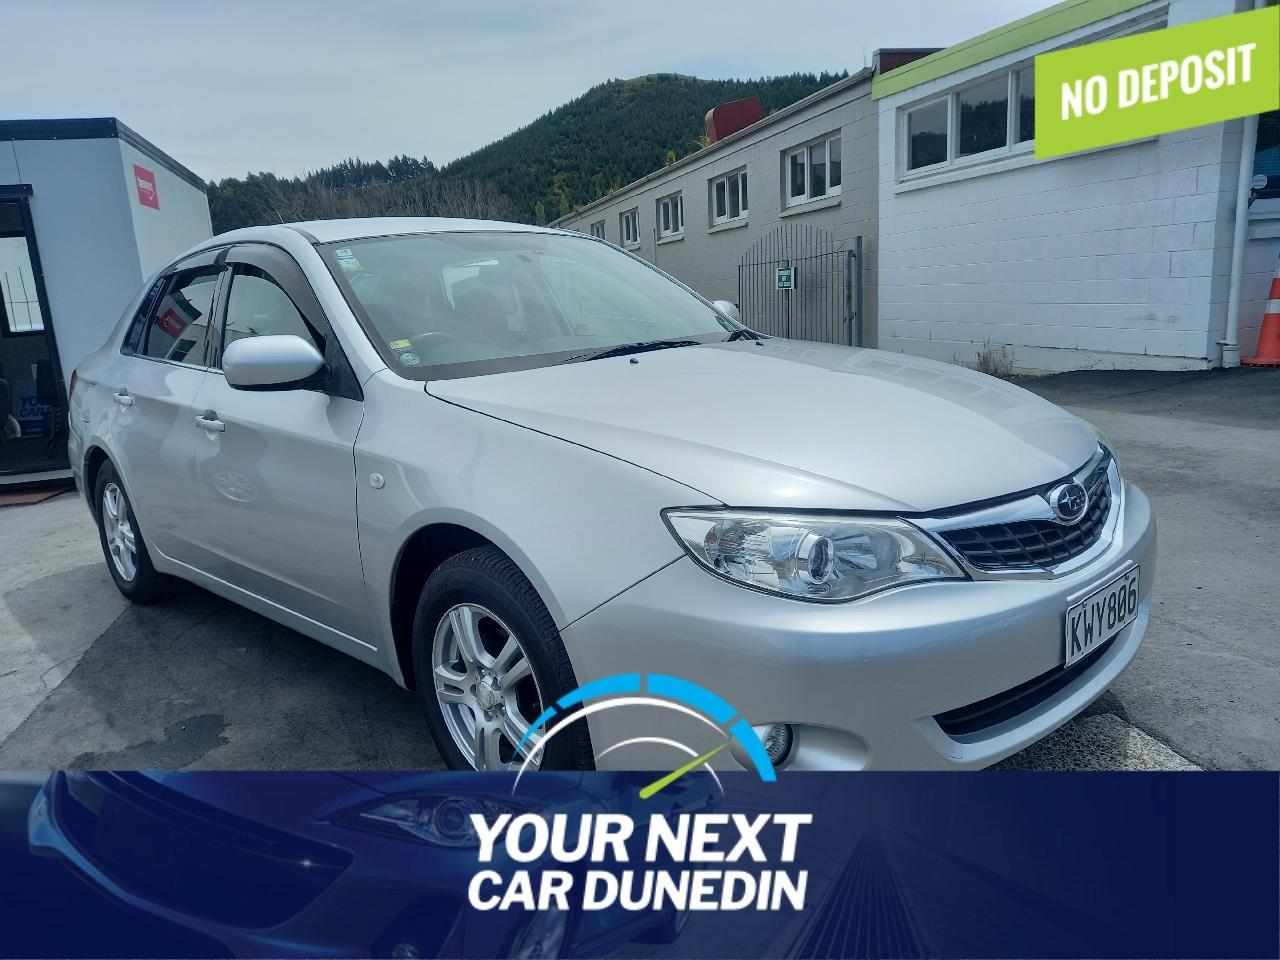 image-0, 2012 Subaru Impreza AWD No Deposit Finance at Dunedin